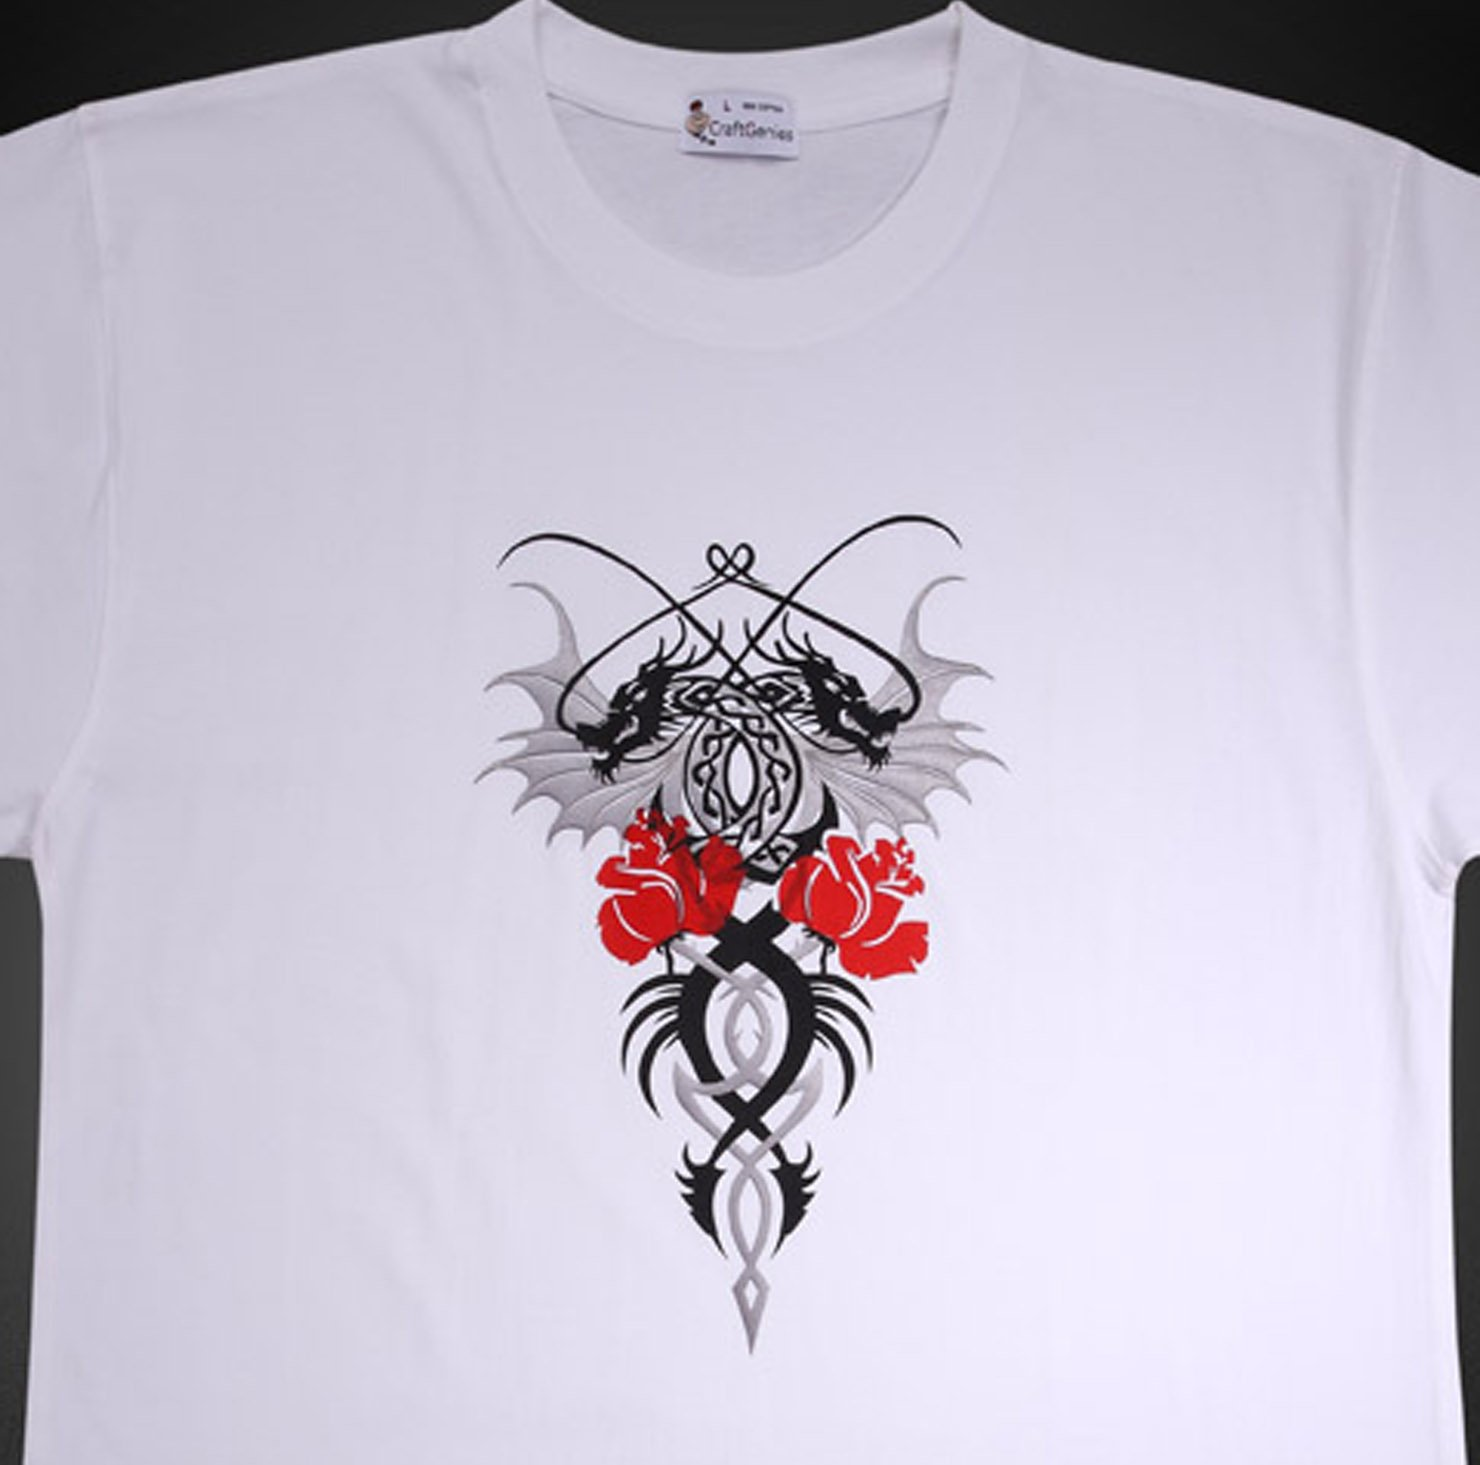 Animal Tee Dragon T Shirt Design for Men -Original Pack  (Men's Large)